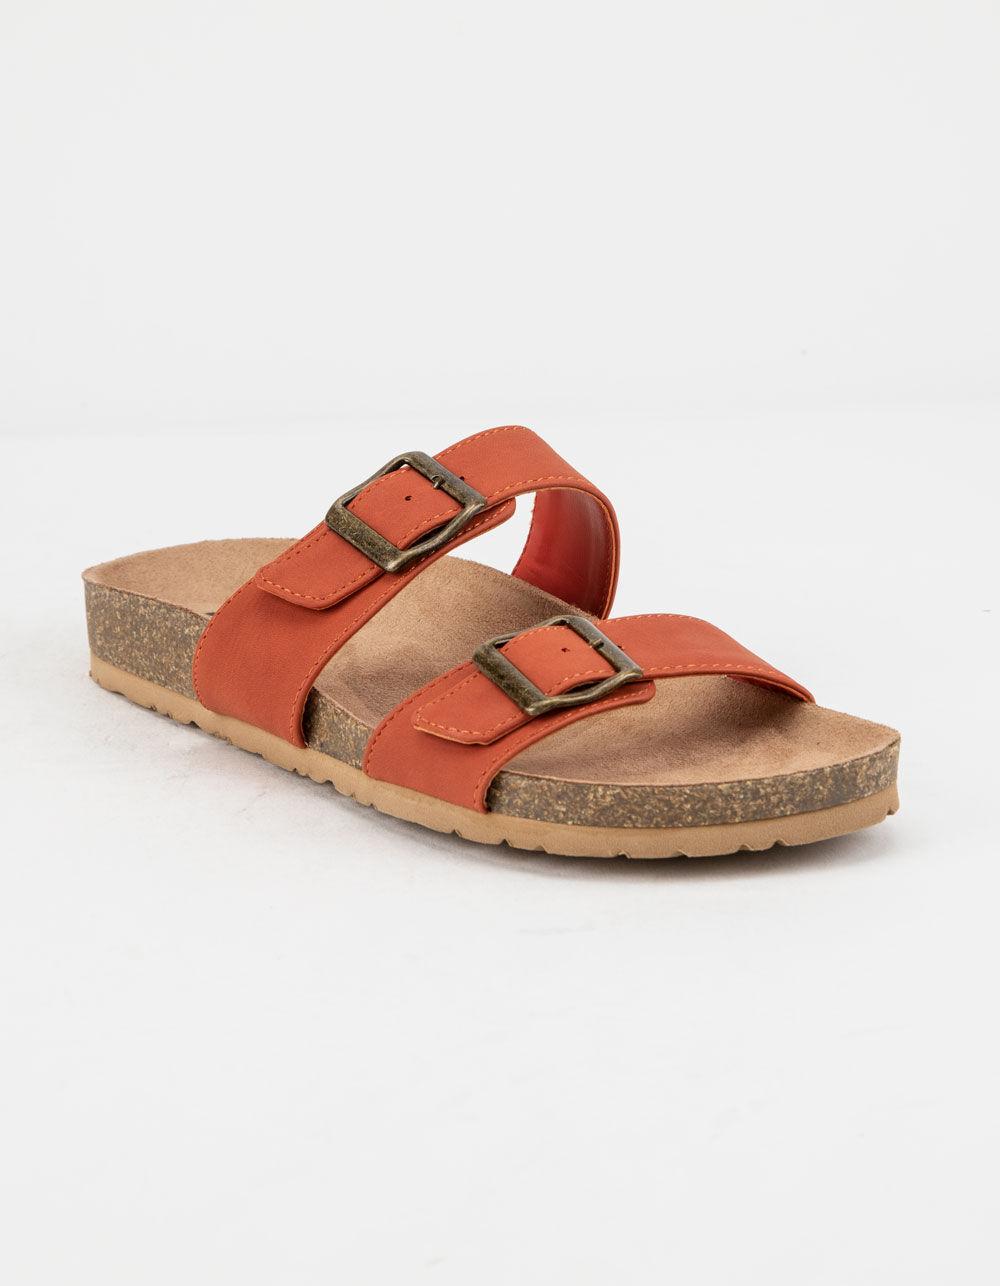 SODA Double Buckle Rust Slide Sandals